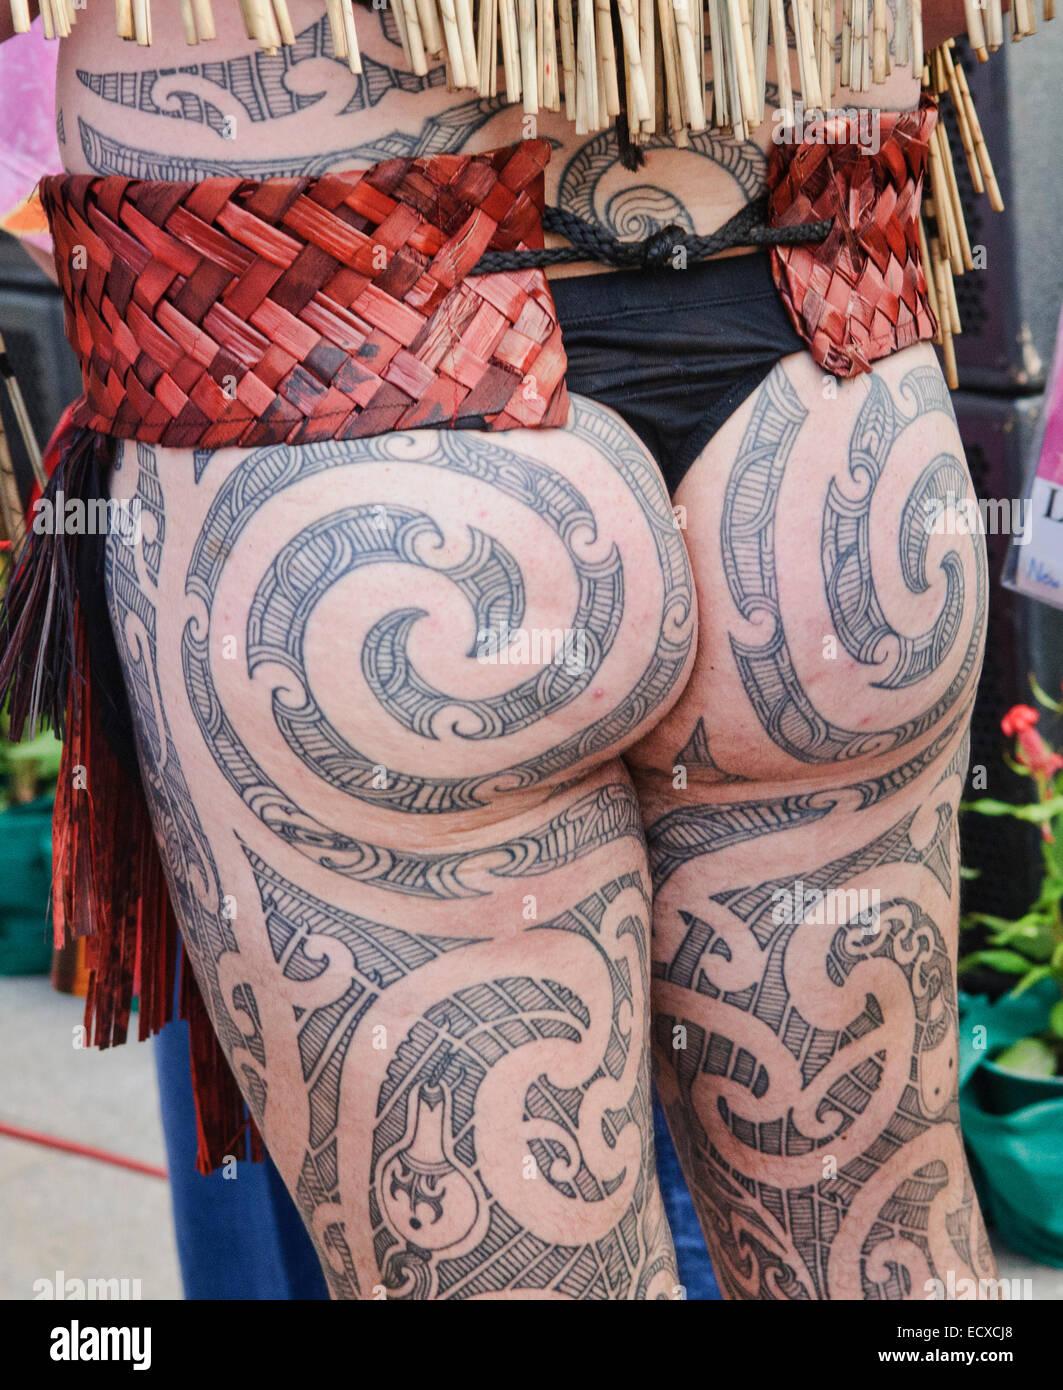 The World Of Maori Tattoo: 7 Wonders Of The World Tattoo